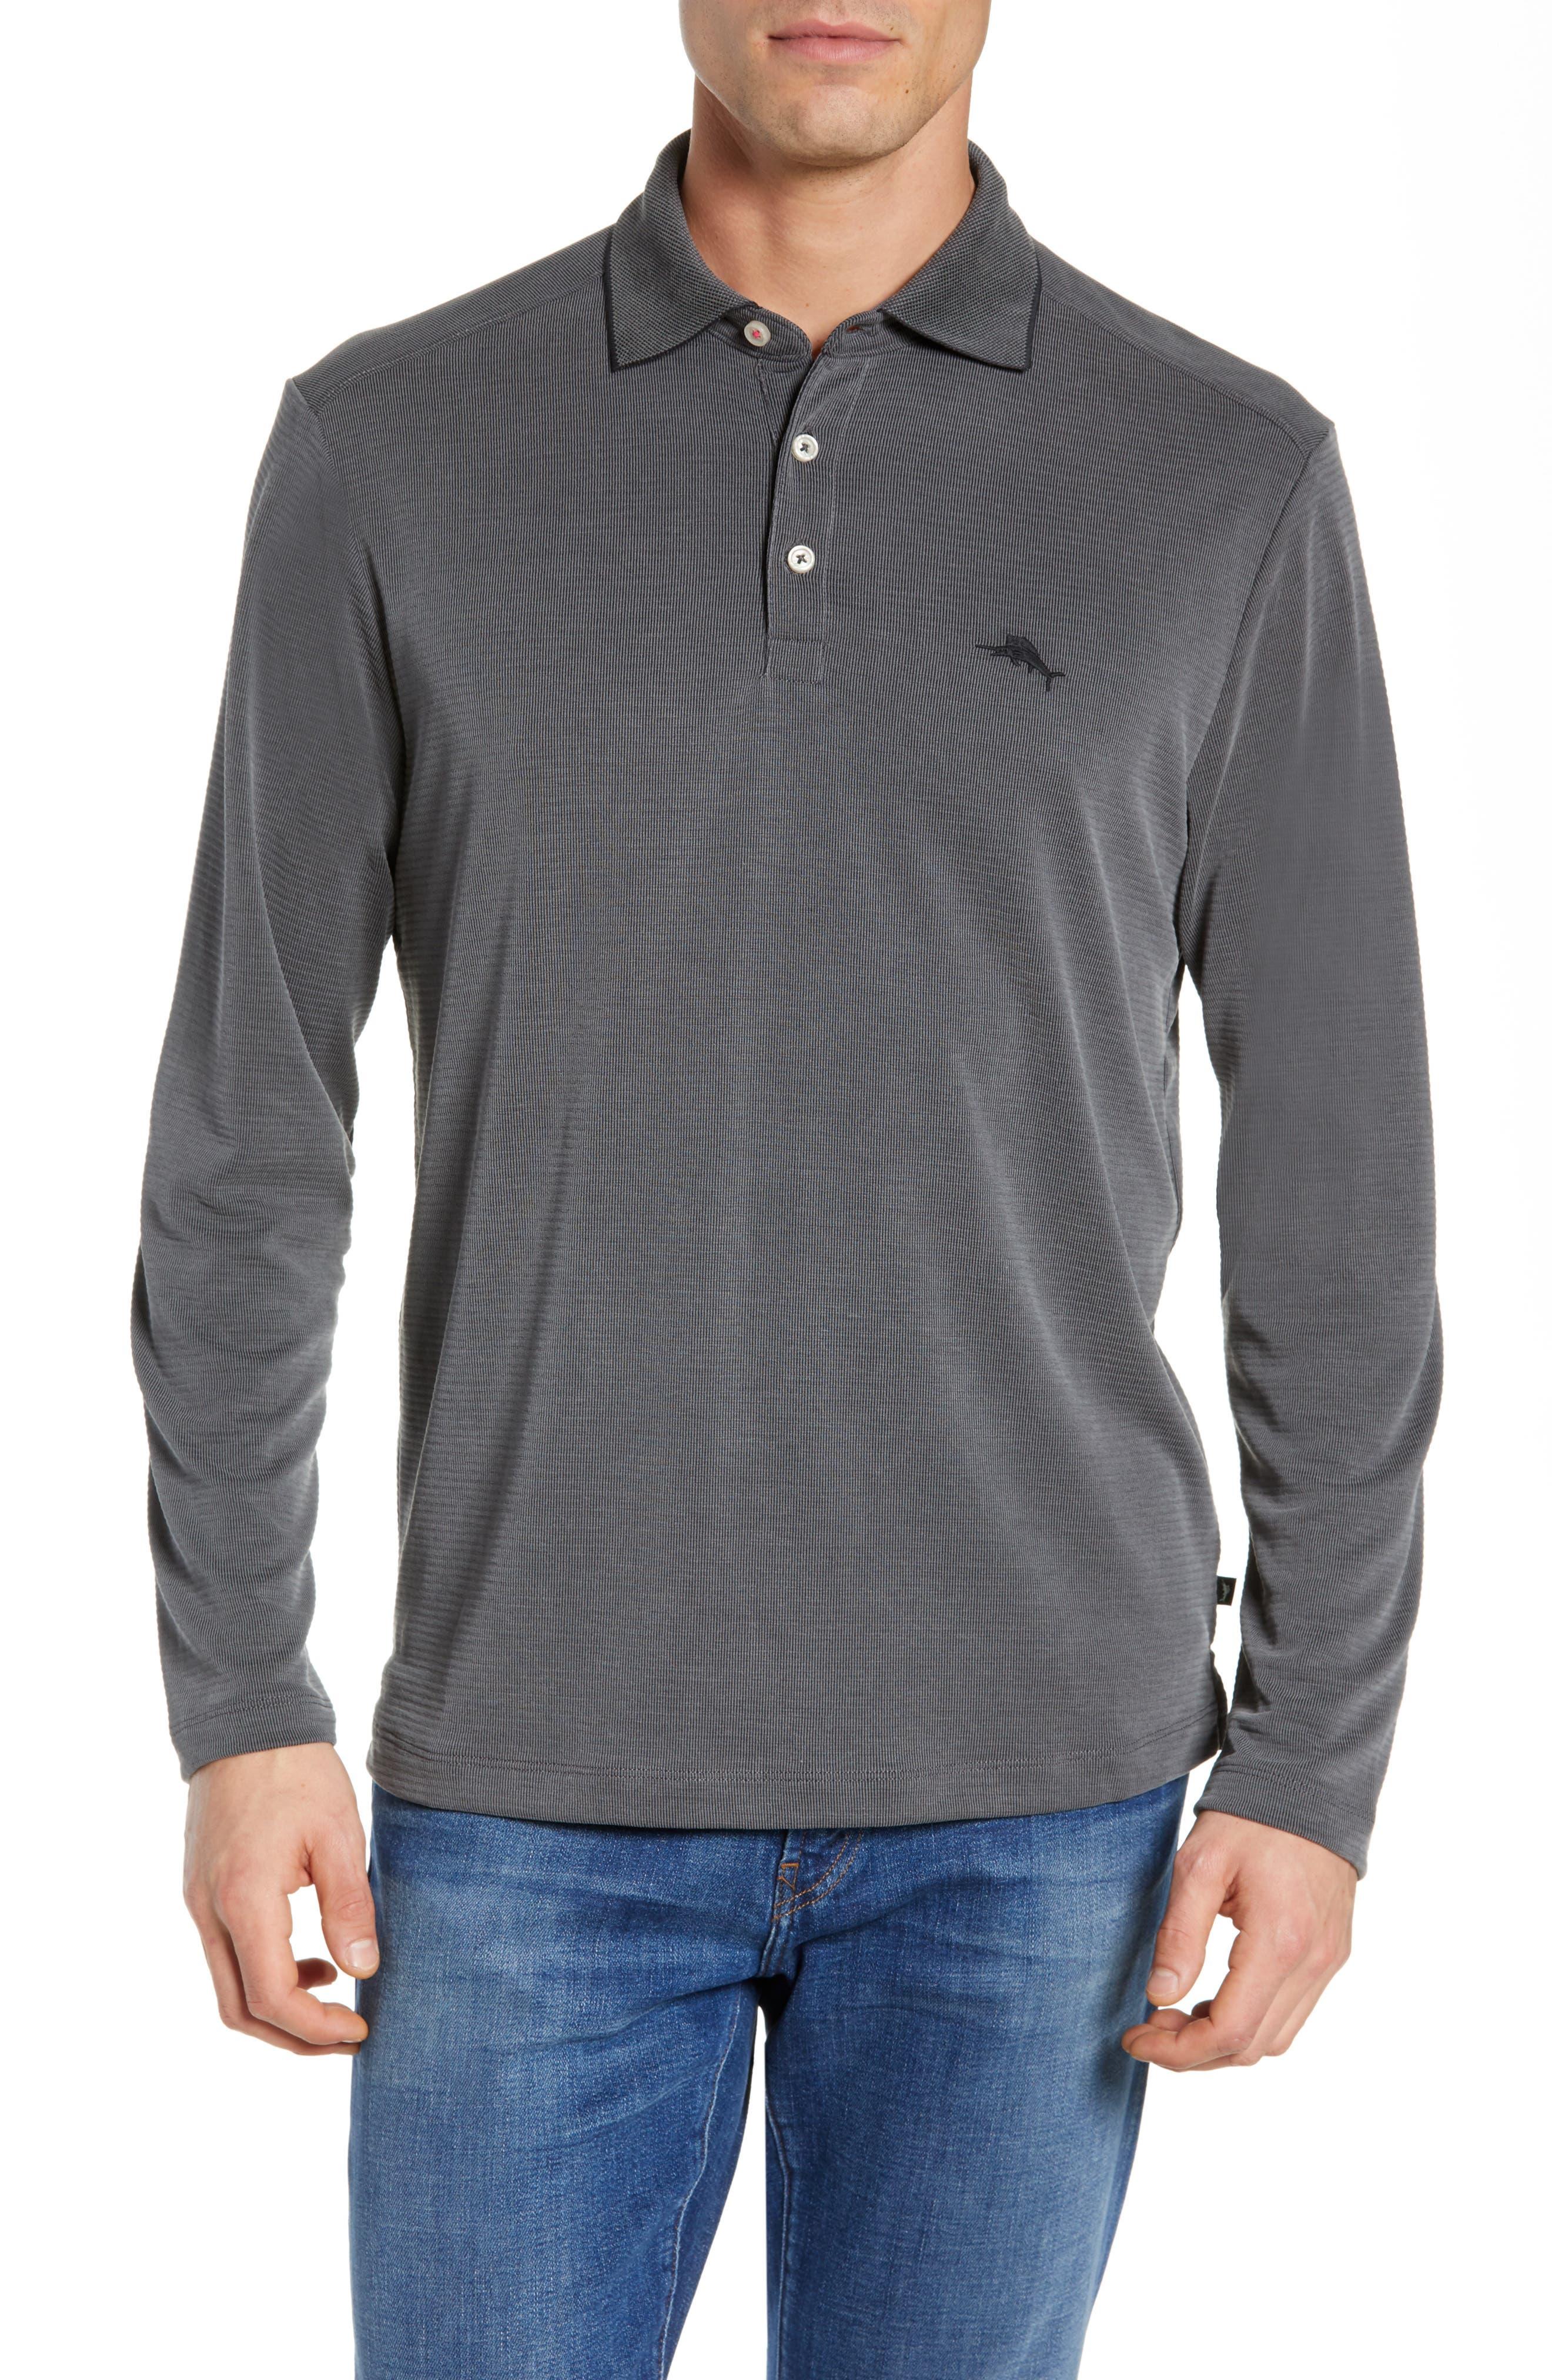 TOMMY BAHAMA, Coastal Crest Regular Fit Polo, Main thumbnail 1, color, BLACK